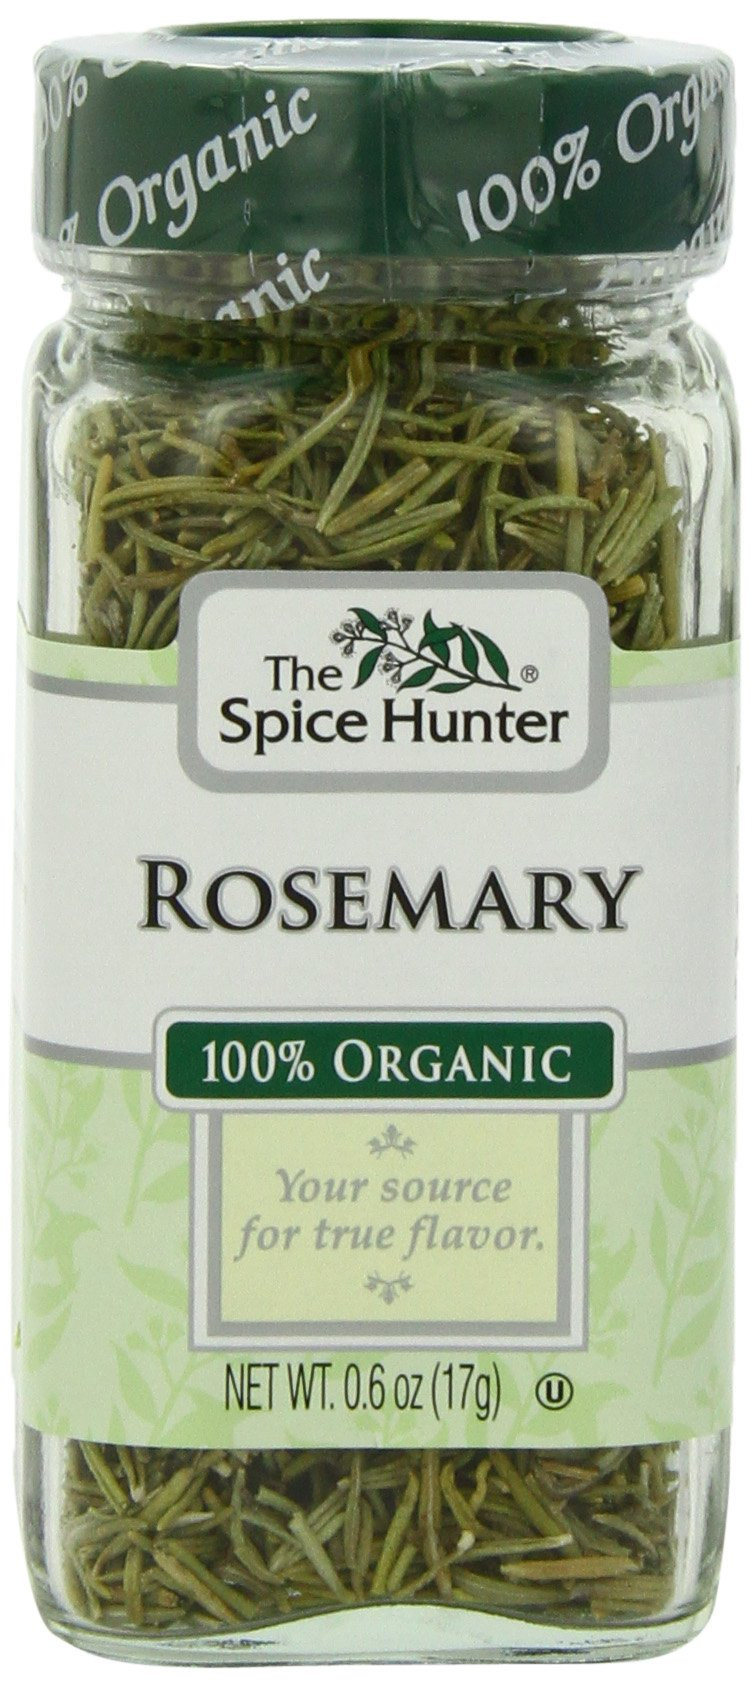 The Spice Hunter Rosemary, Organic, 0.6-Ounce Jar